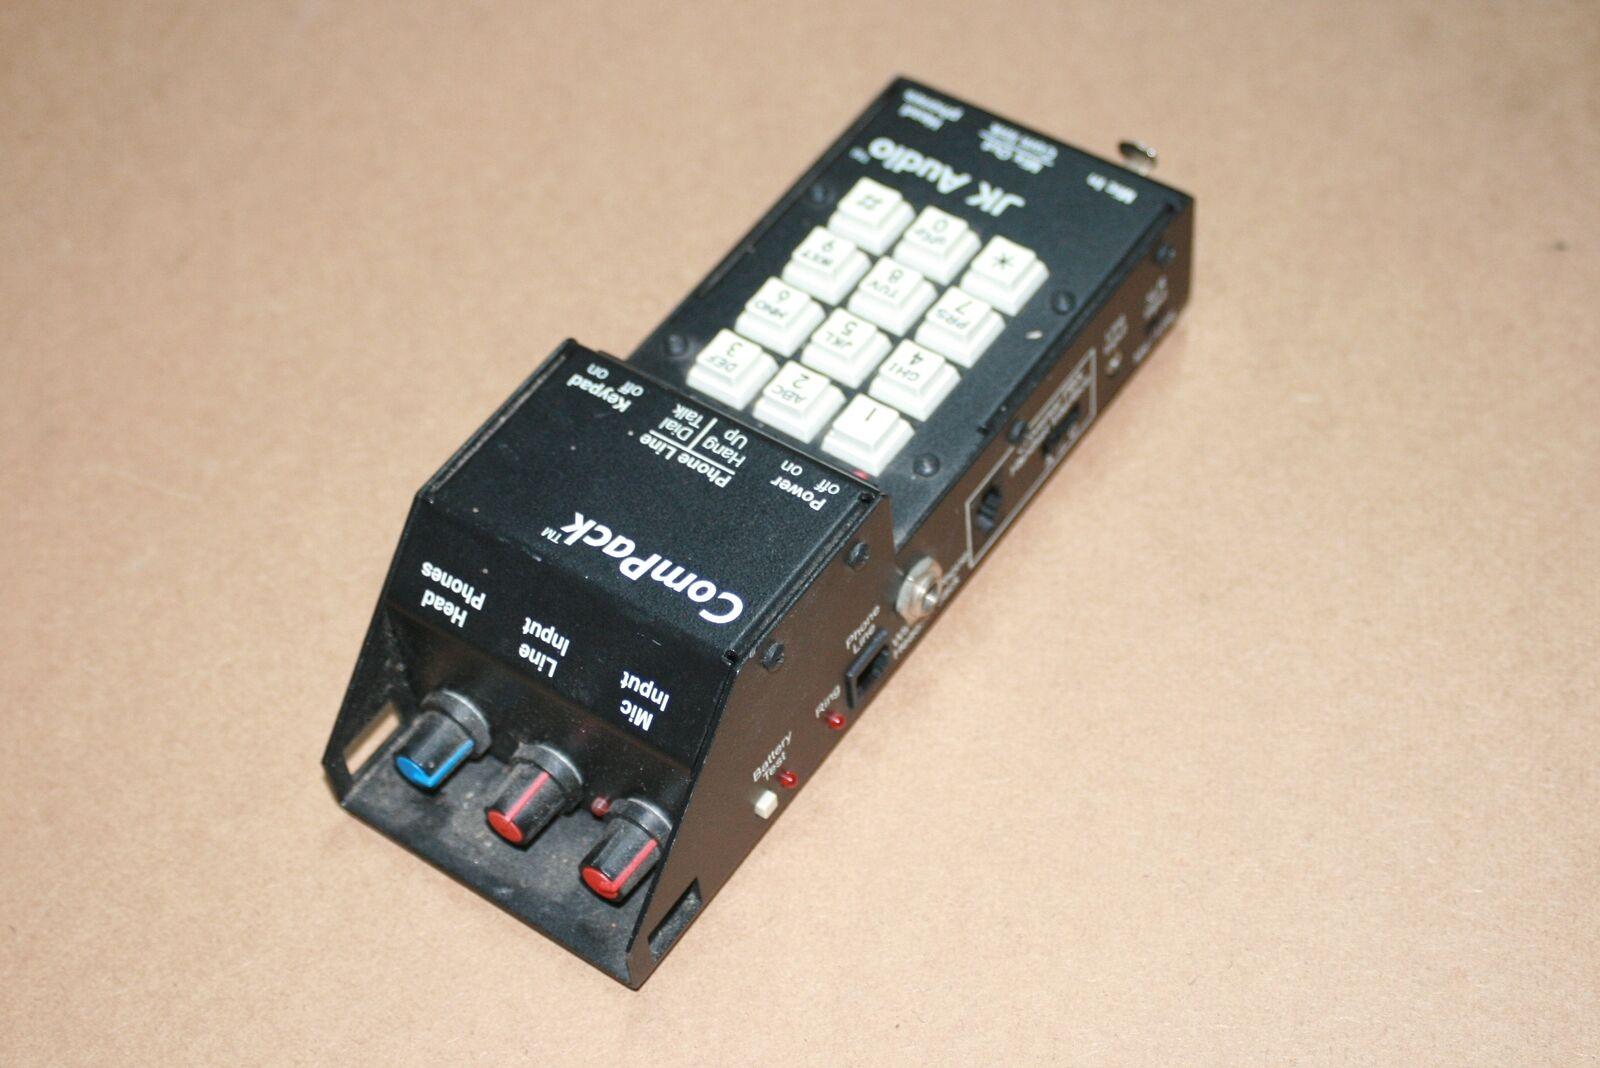 JK Audio ComPack Universal Telefon Audio Interface IFB Field Mixer